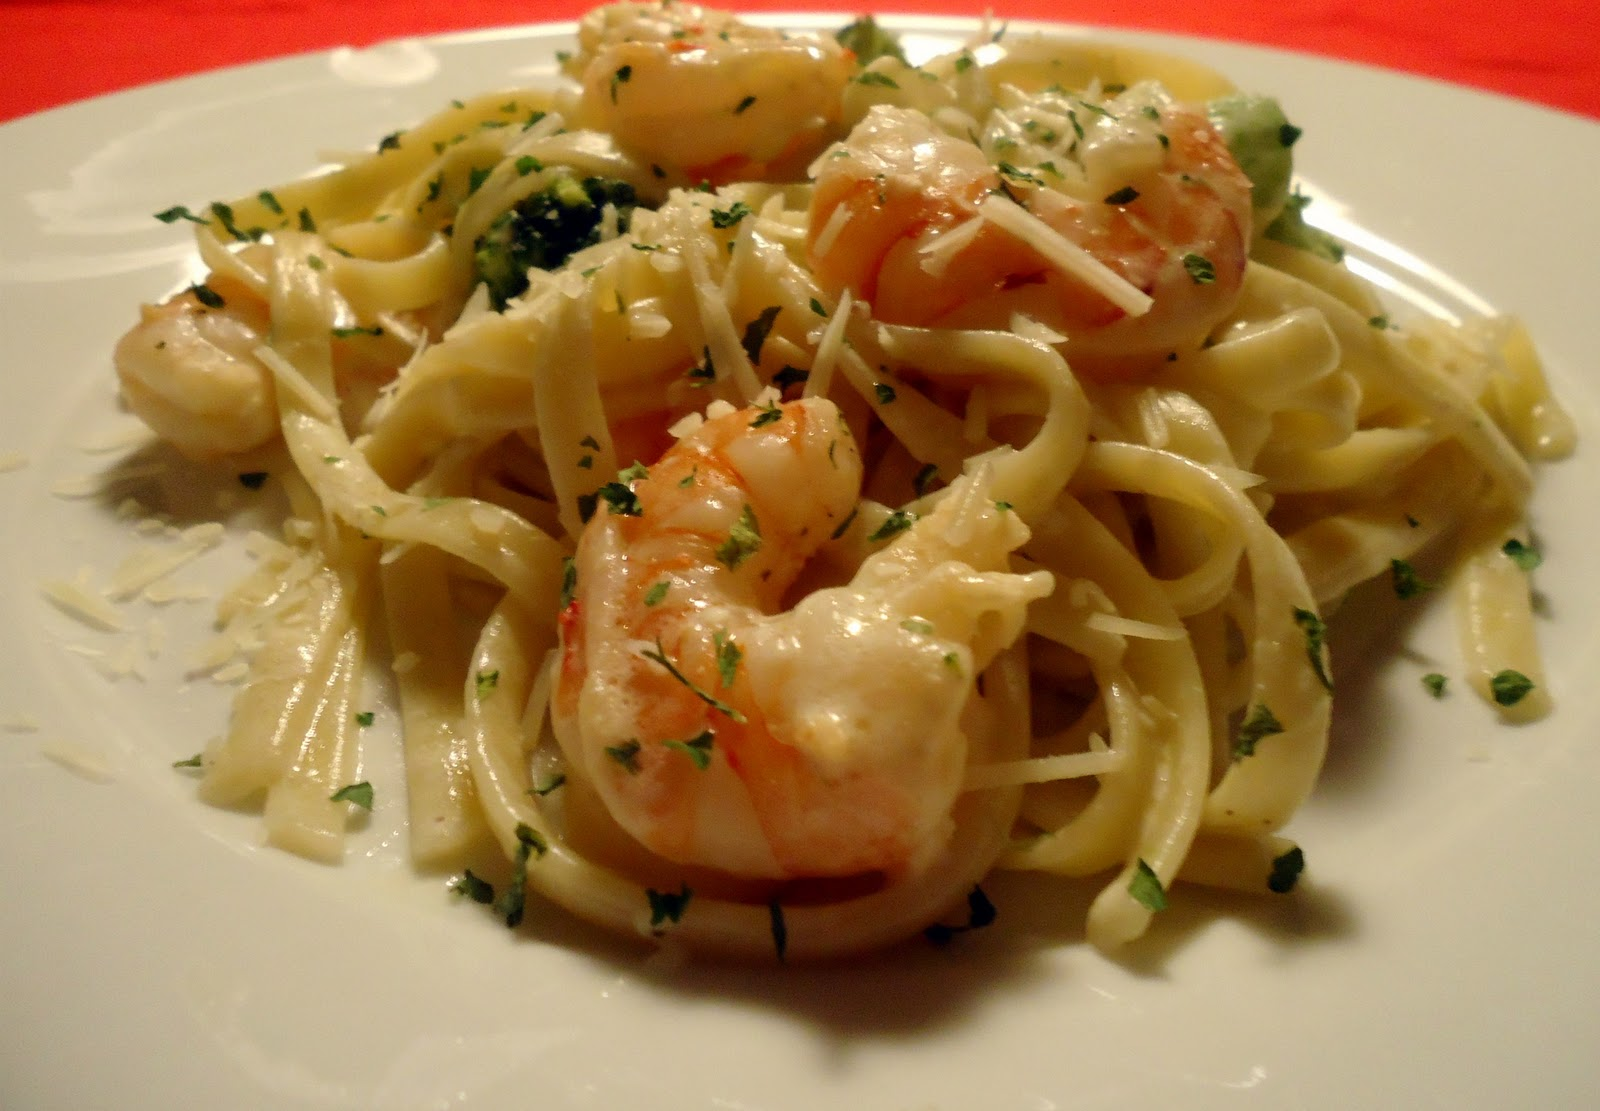 Still Lucky: Shrimp Fettuccine Alfredo